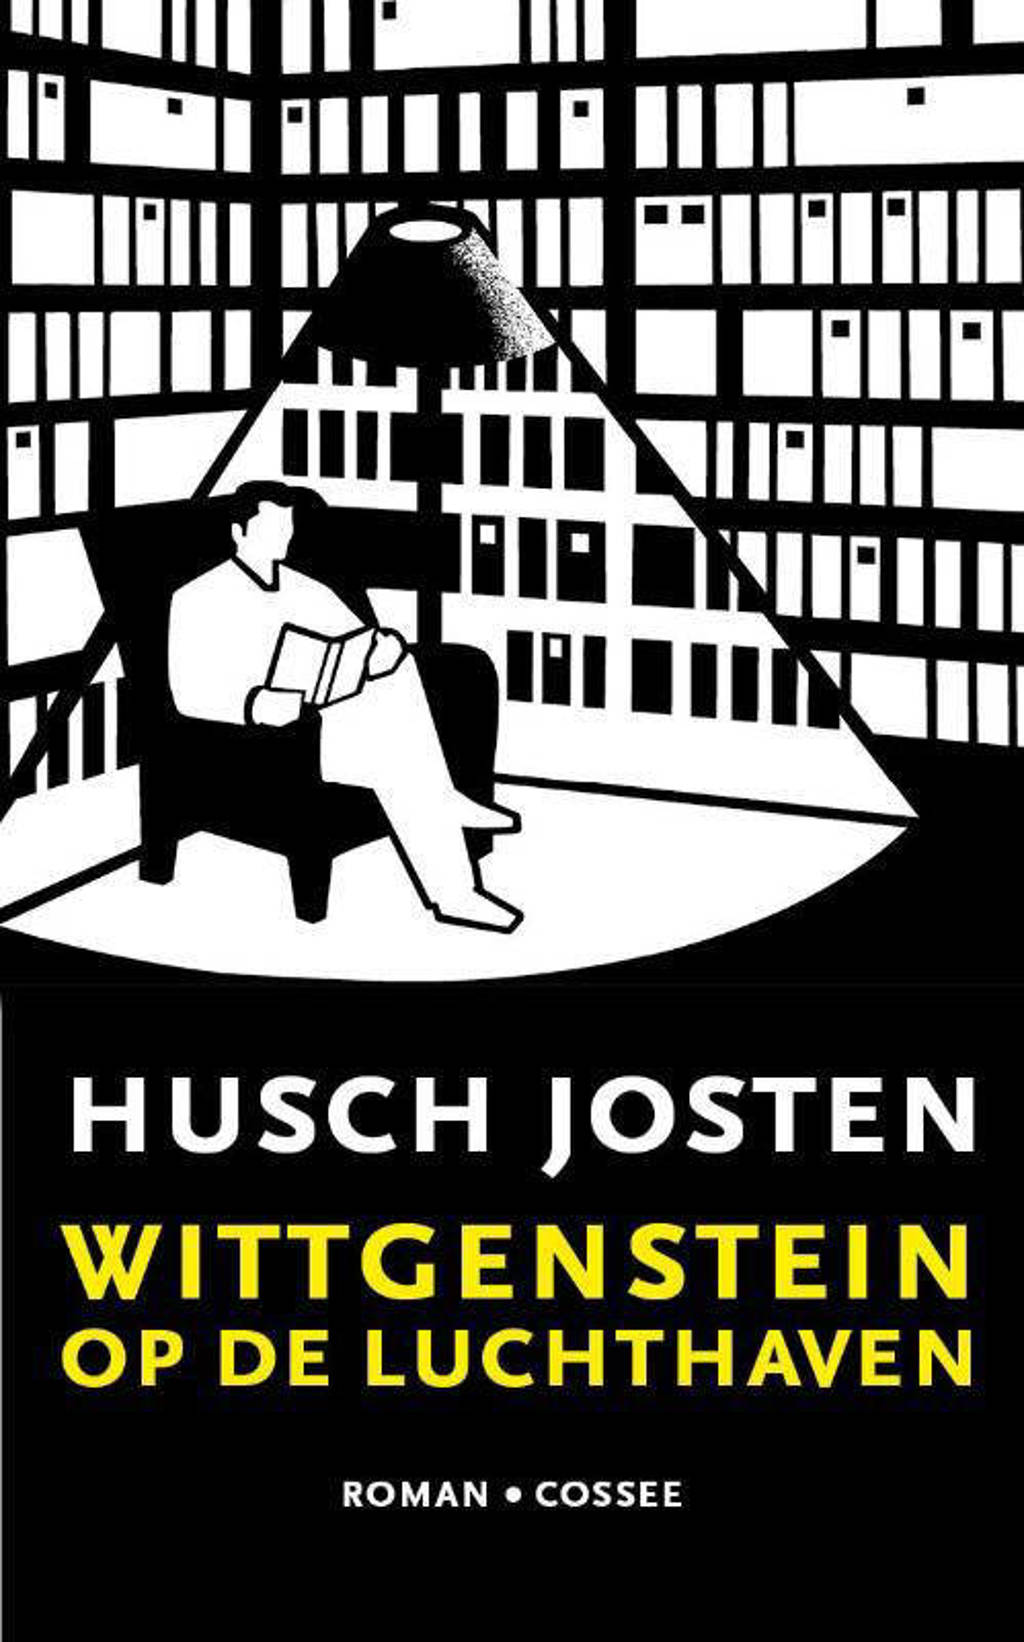 Wittgenstein op de luchthaven - Husch Josten